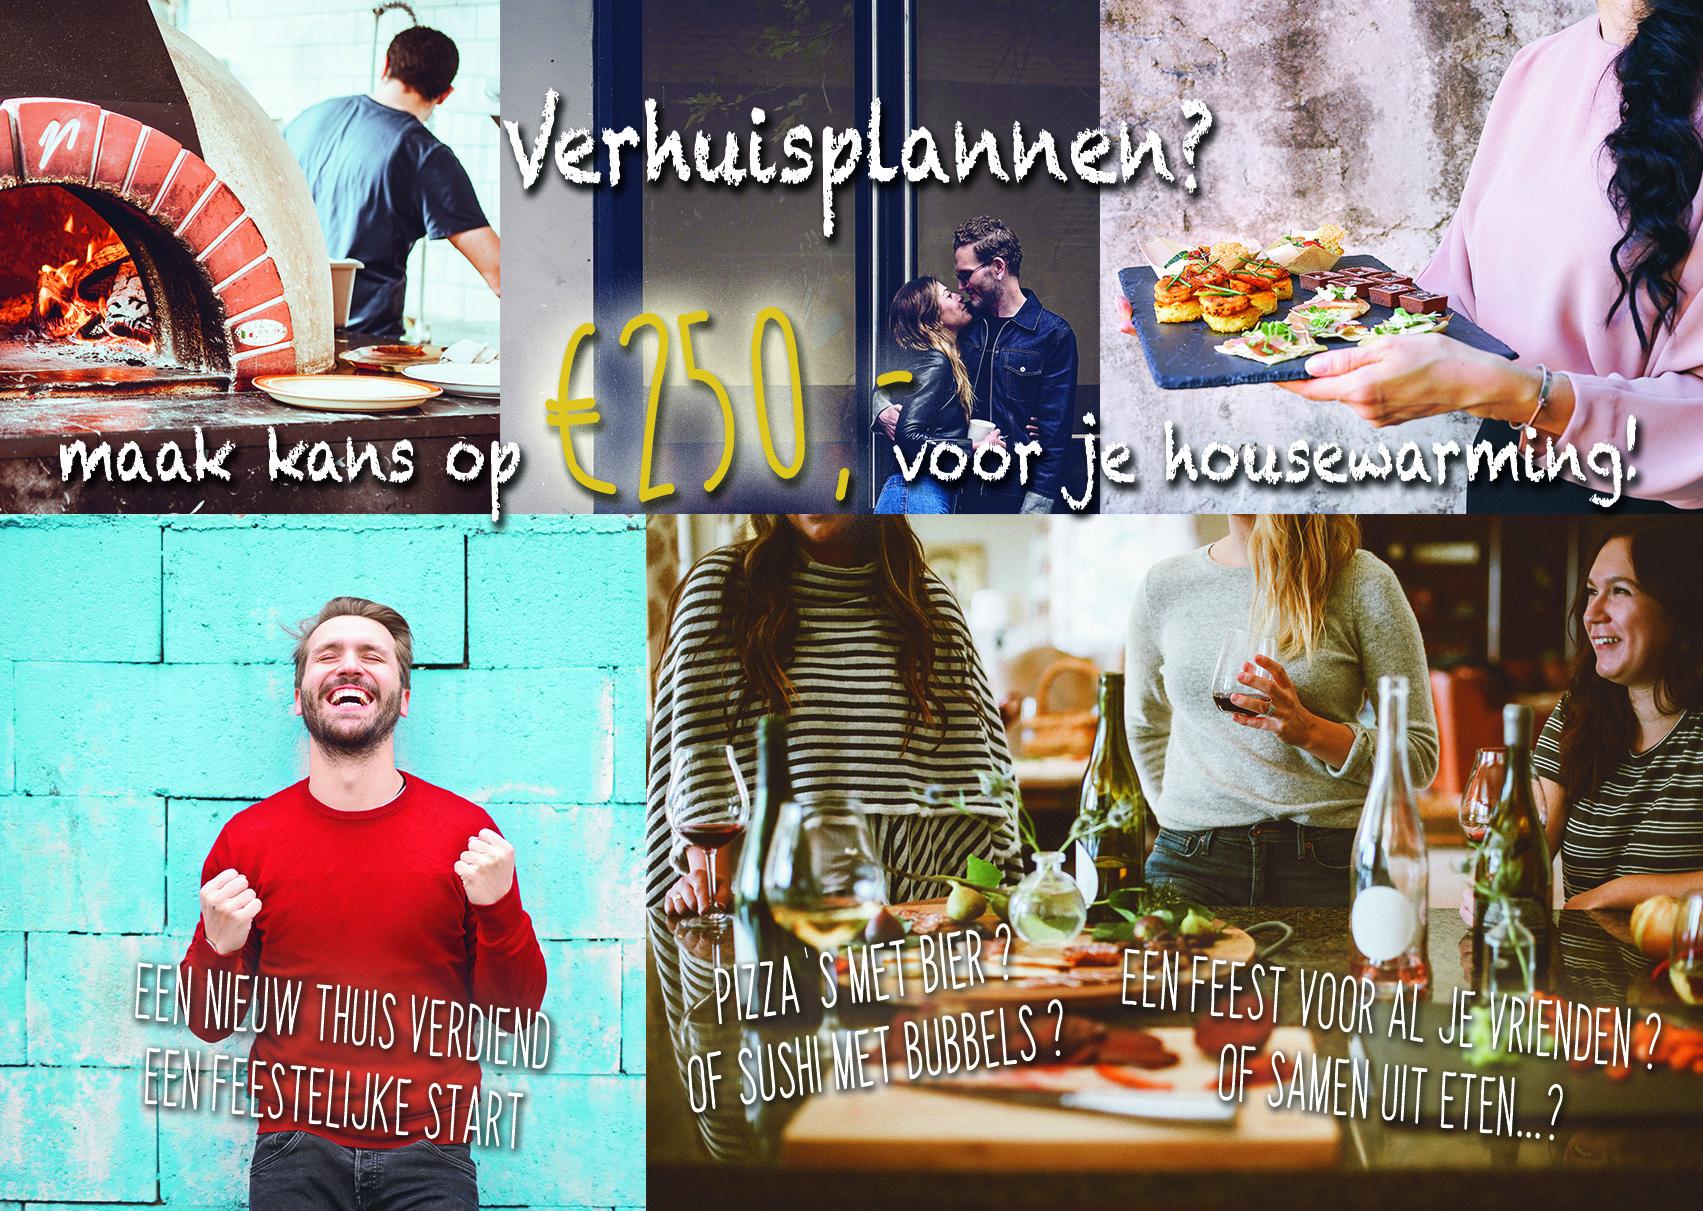 maak kans op 250,- euro voor je housewarming